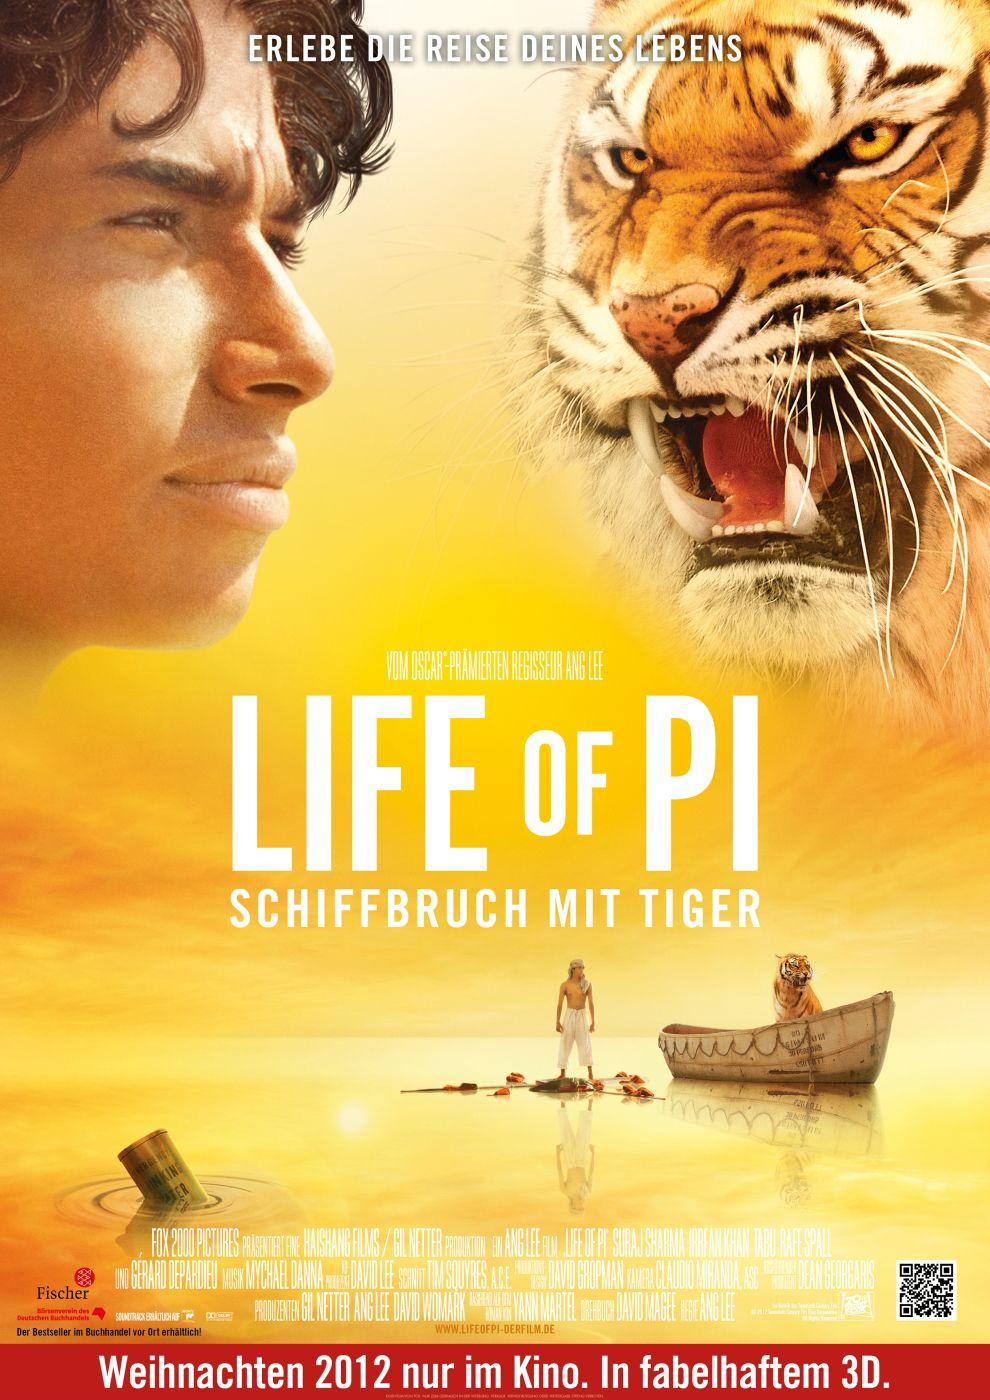 Film Mit Tiger